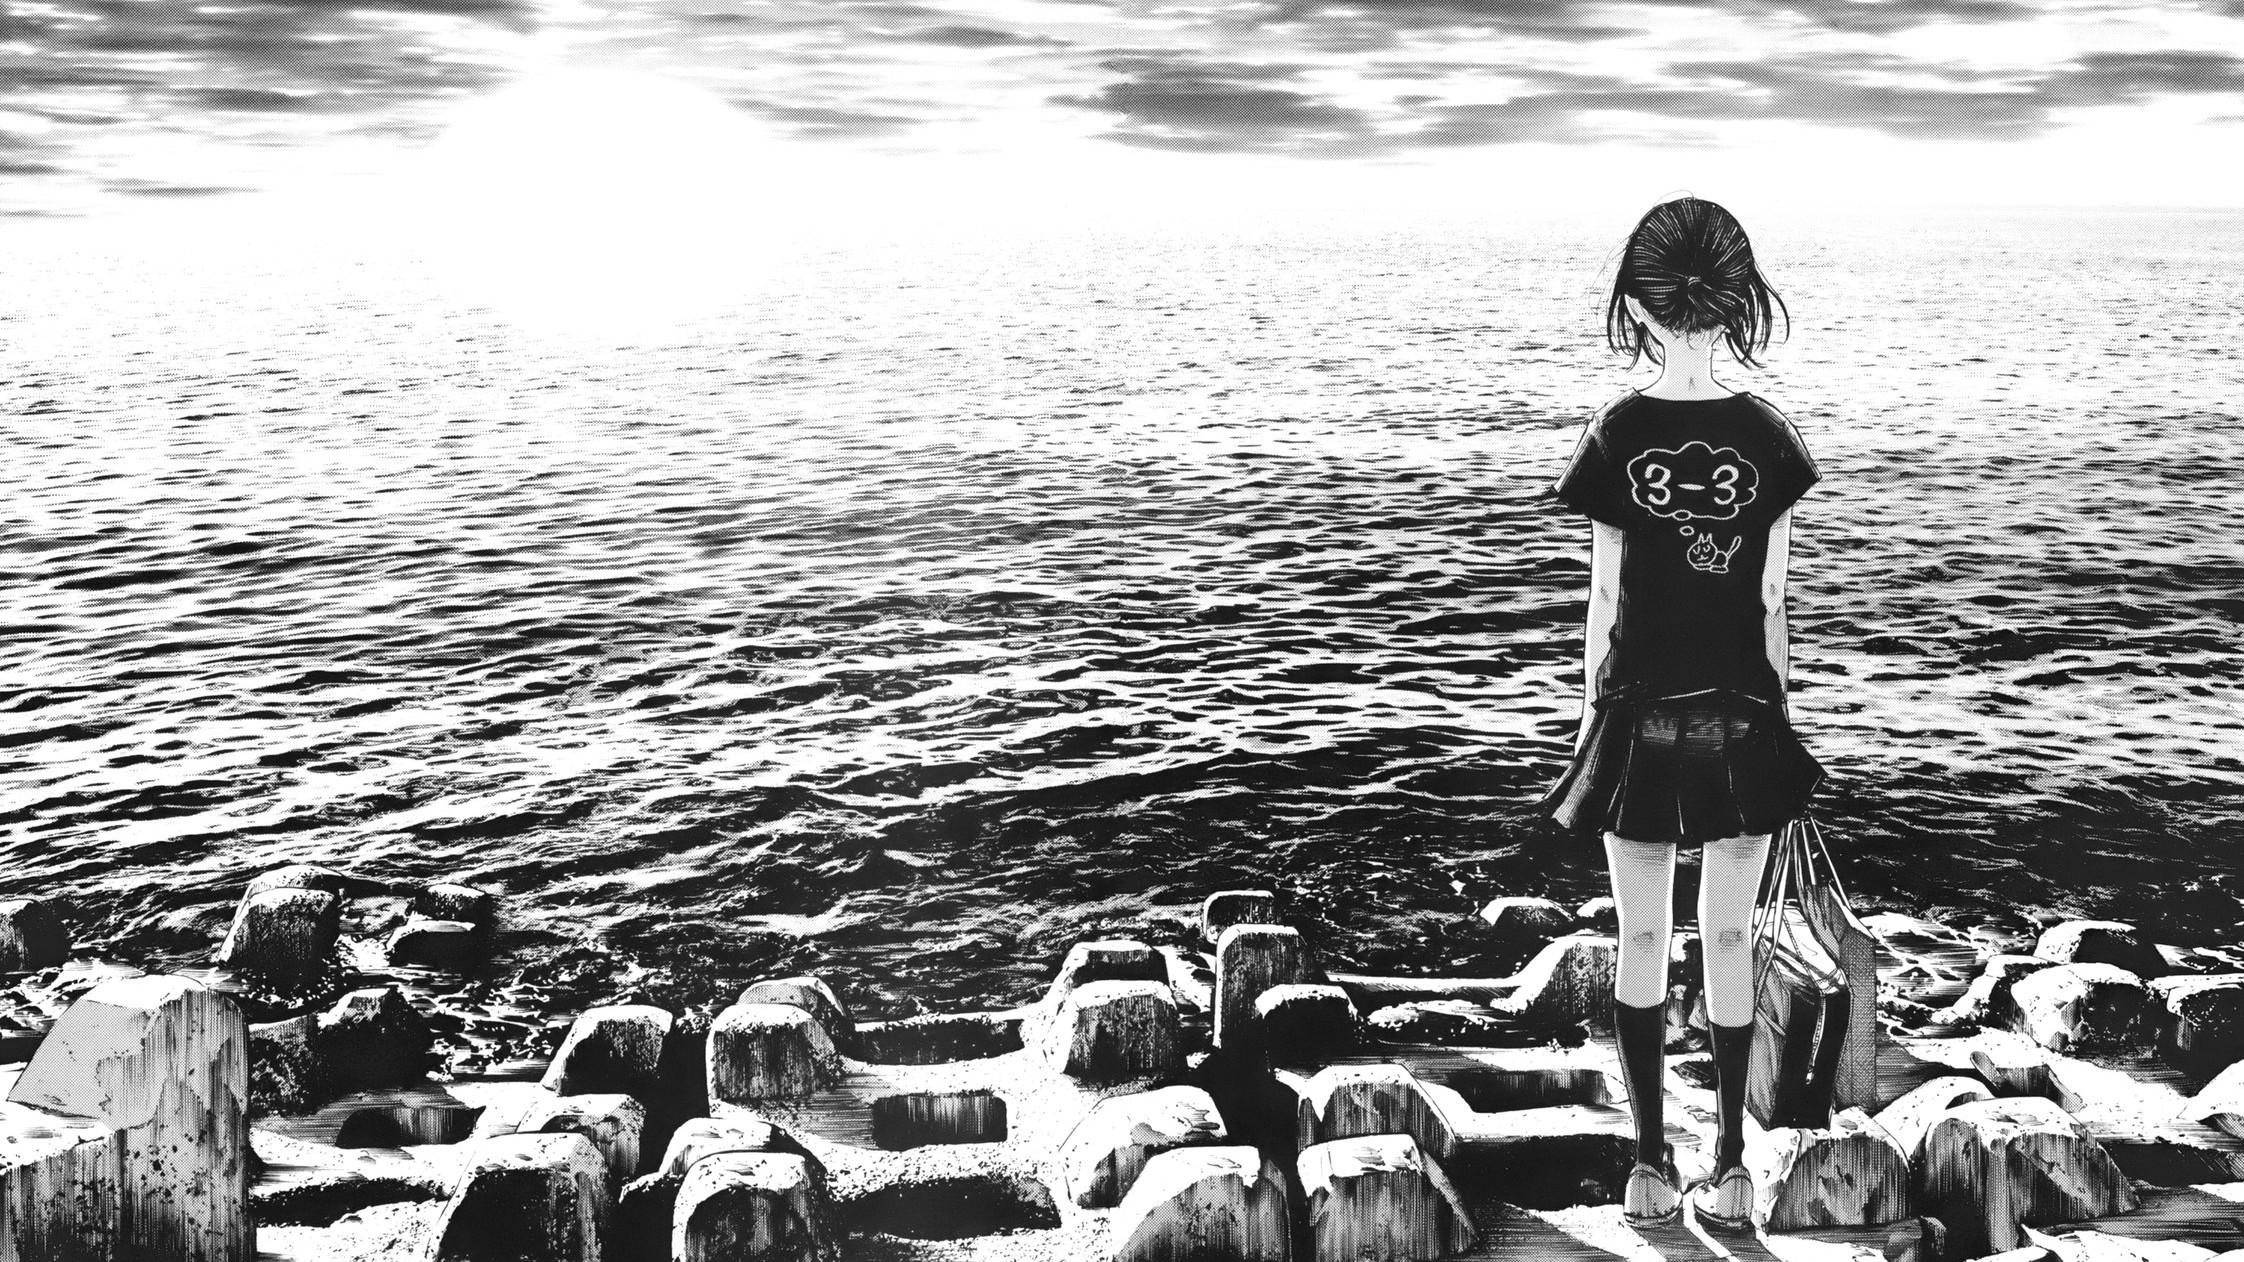 Wallpaper manga satu warna laut wanita gambar